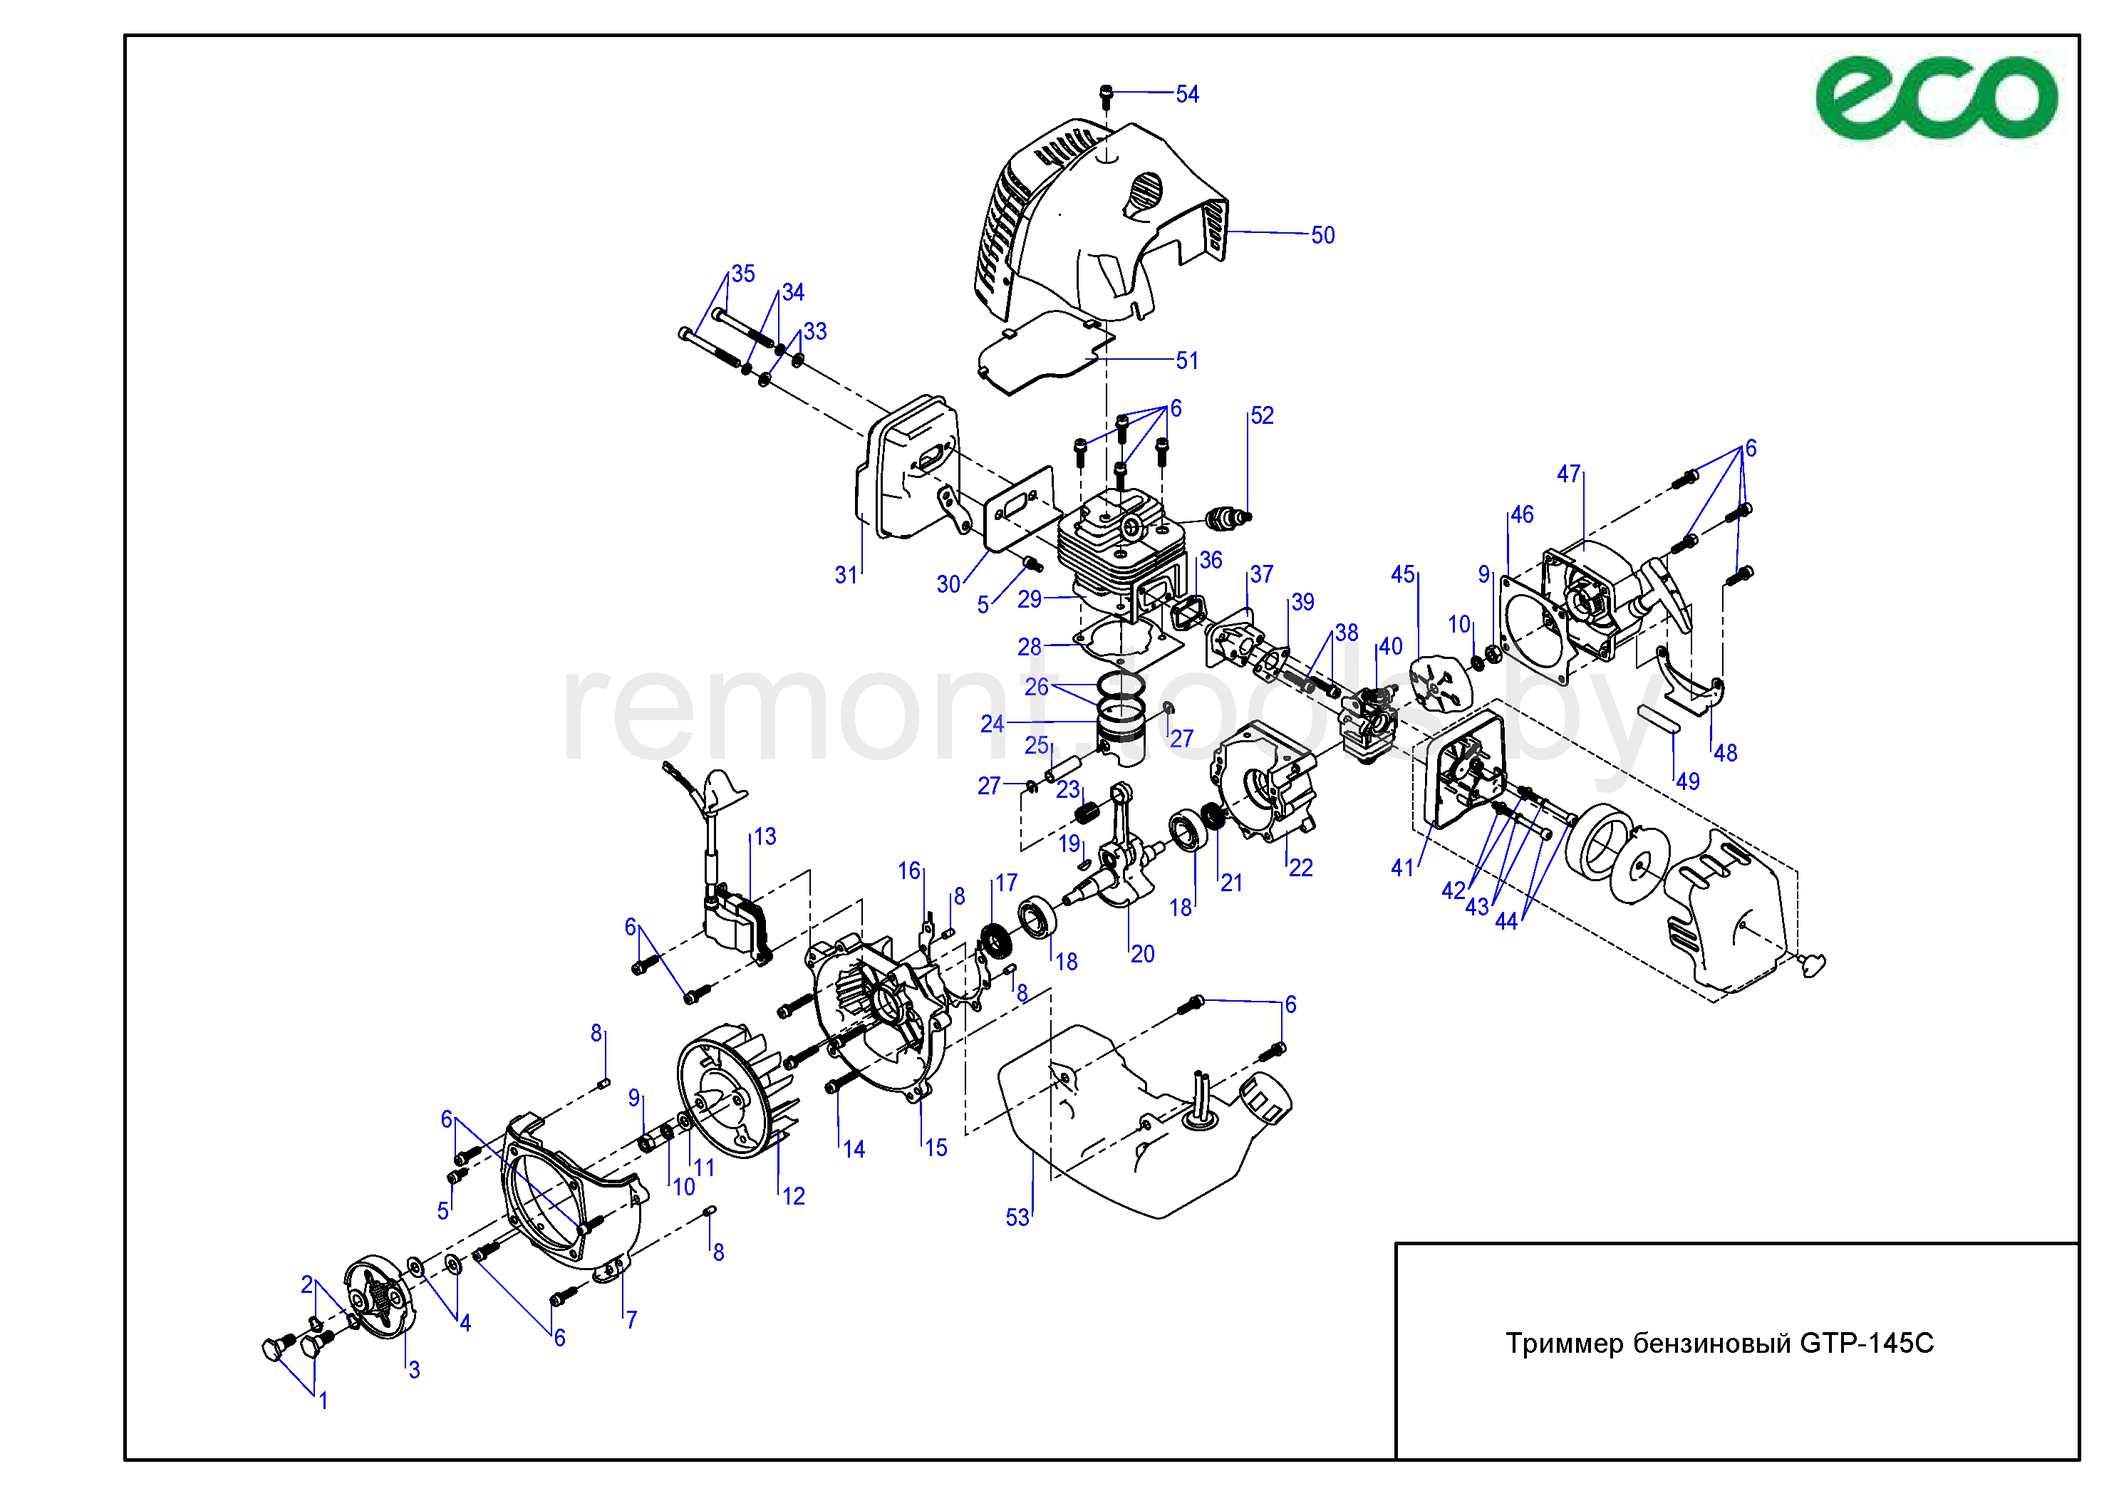 Eco Триммер бензиновый Gtp 145c